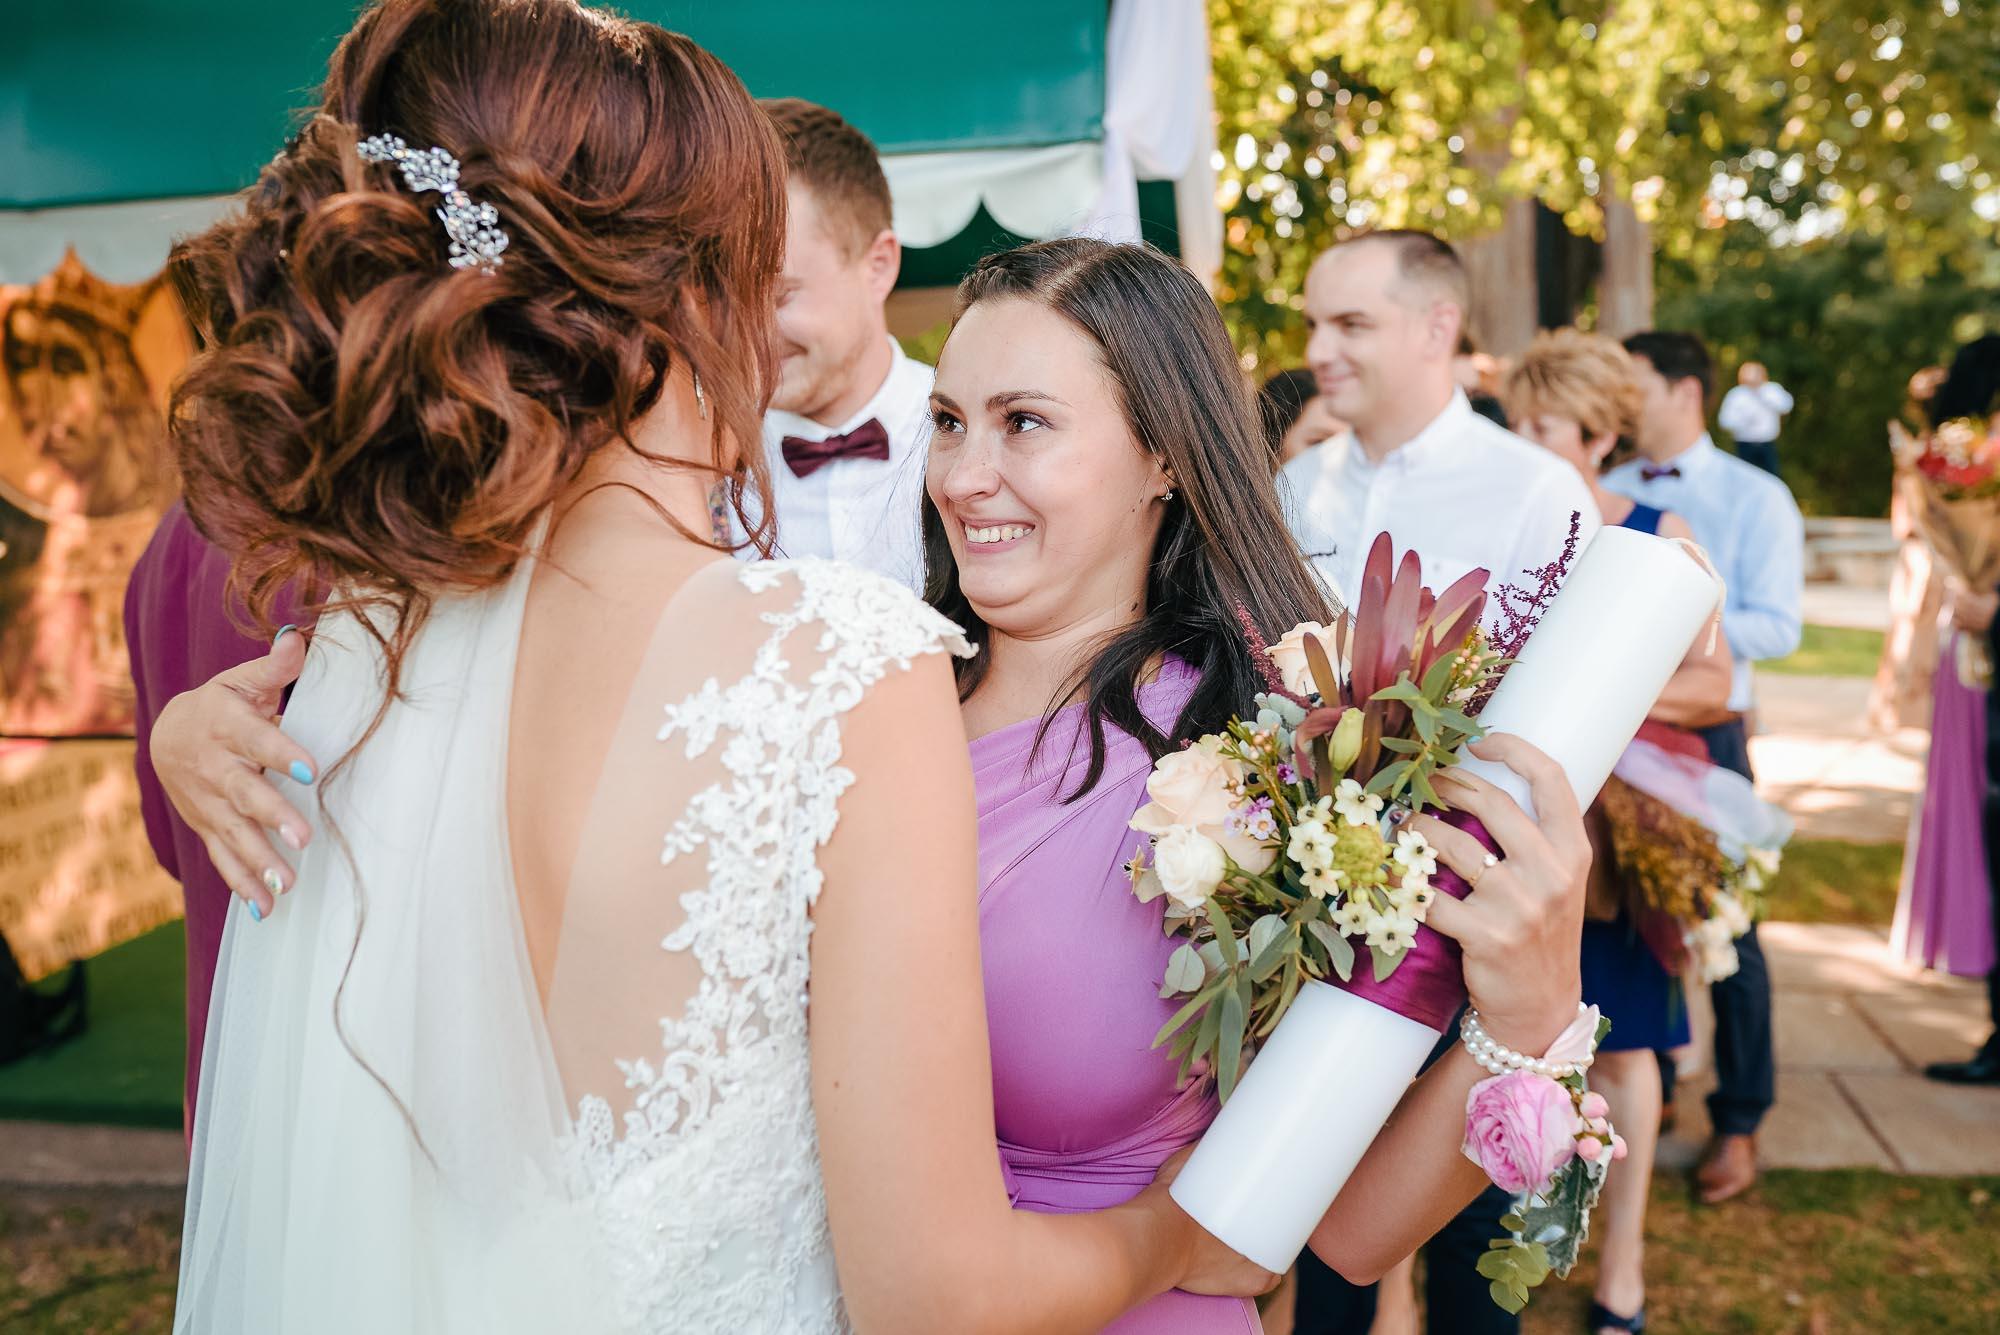 fotograf nunta bacau, fotograf bacau, fotograf profesionist bacau, fotograf suceava, fotograf nunta suceava, fotograf iasi, fotograf nunta iasi, fotograf bucuresti, fotograf nunta bucuresti, fotograf piatra neamt, fotograf nunta piatra neamt